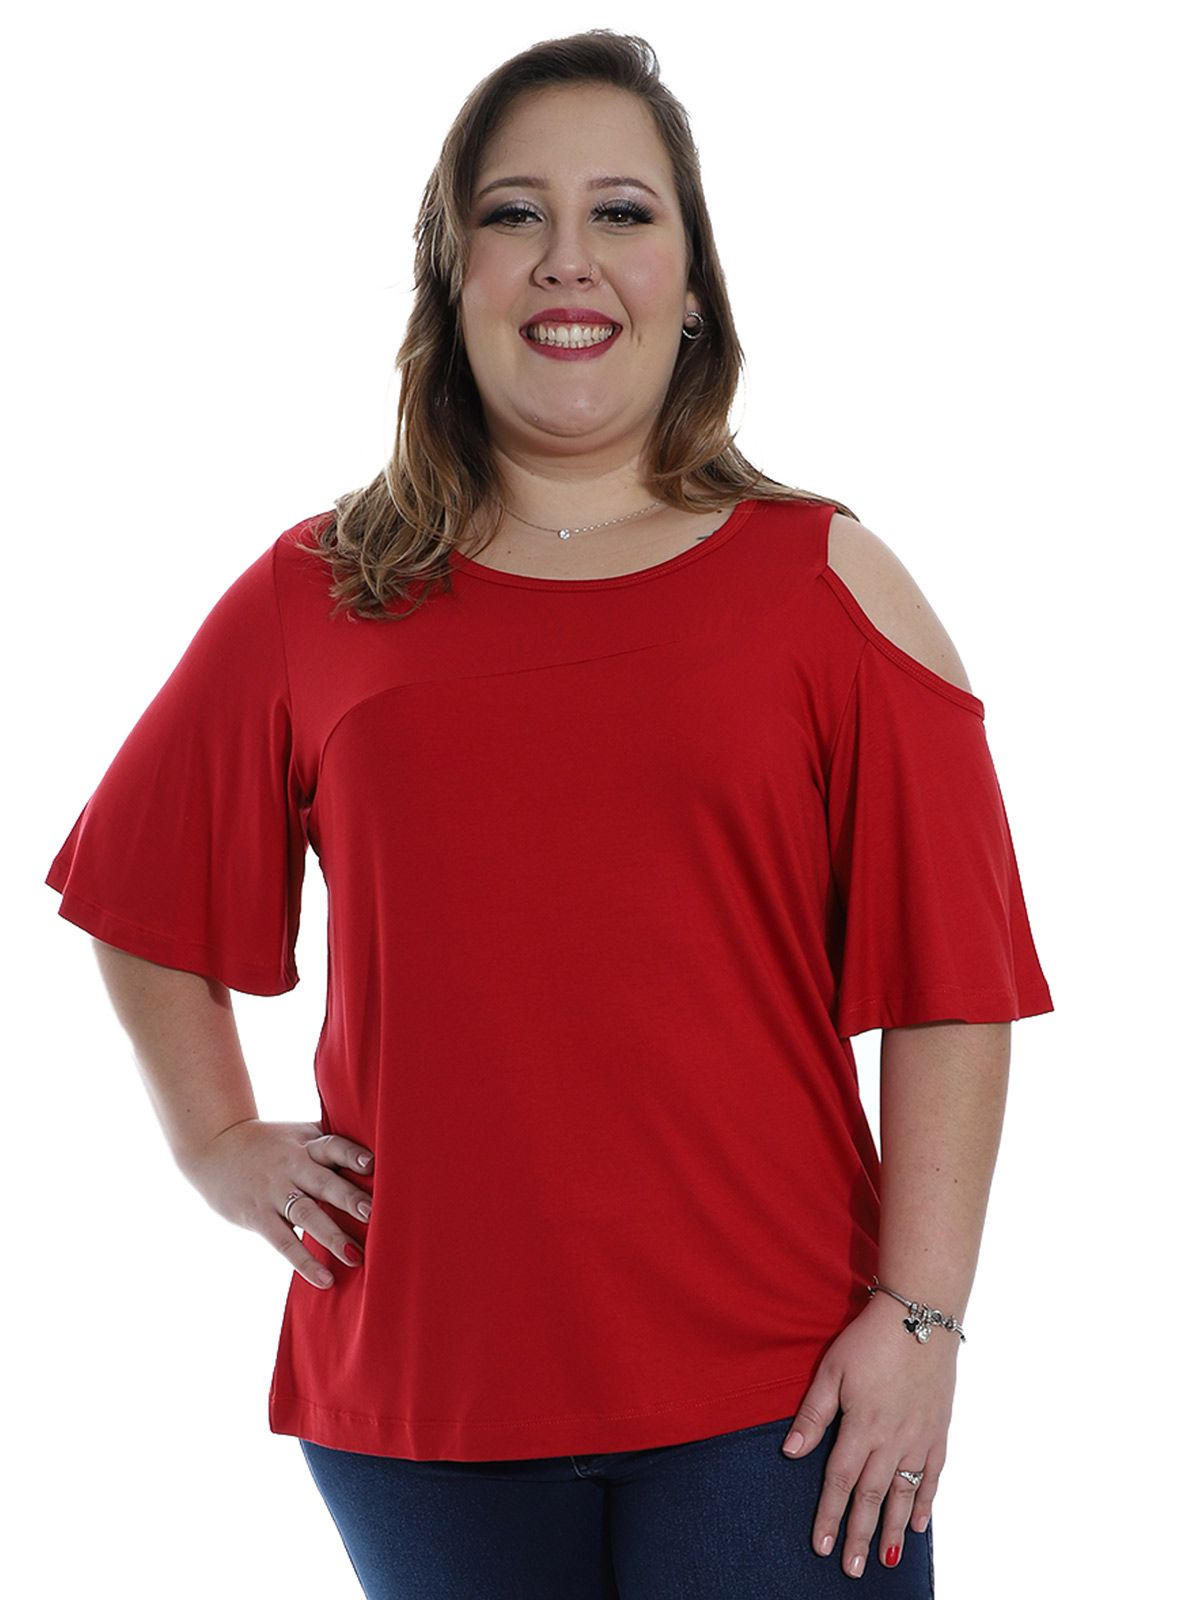 Blusa Plus Size KTS Recortes Vermelho